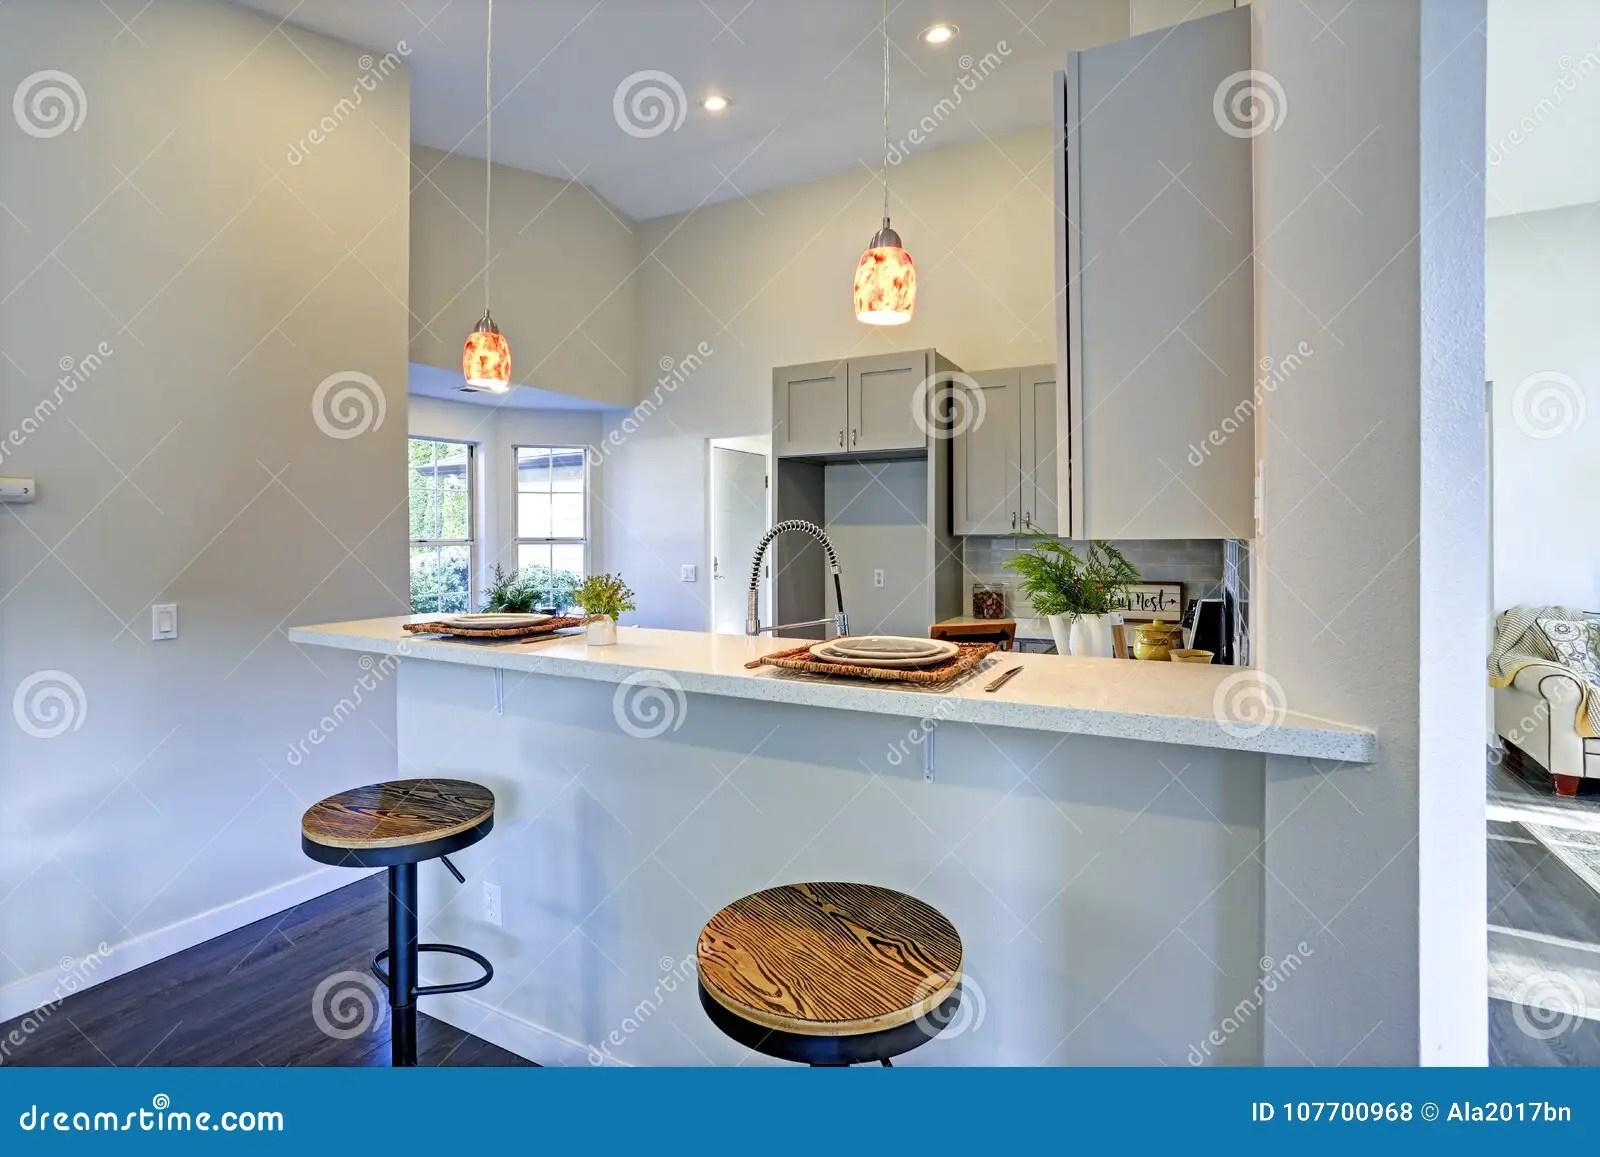 industrial kitchen stools black and white rug 与酒吧样式厨房的浅灰色的厨房室内部库存照片 图片包括有垂饰 发光 与酒吧样式五颜六色的垂饰和圆的凳子的浅灰色的厨房室内部照亮的厨房